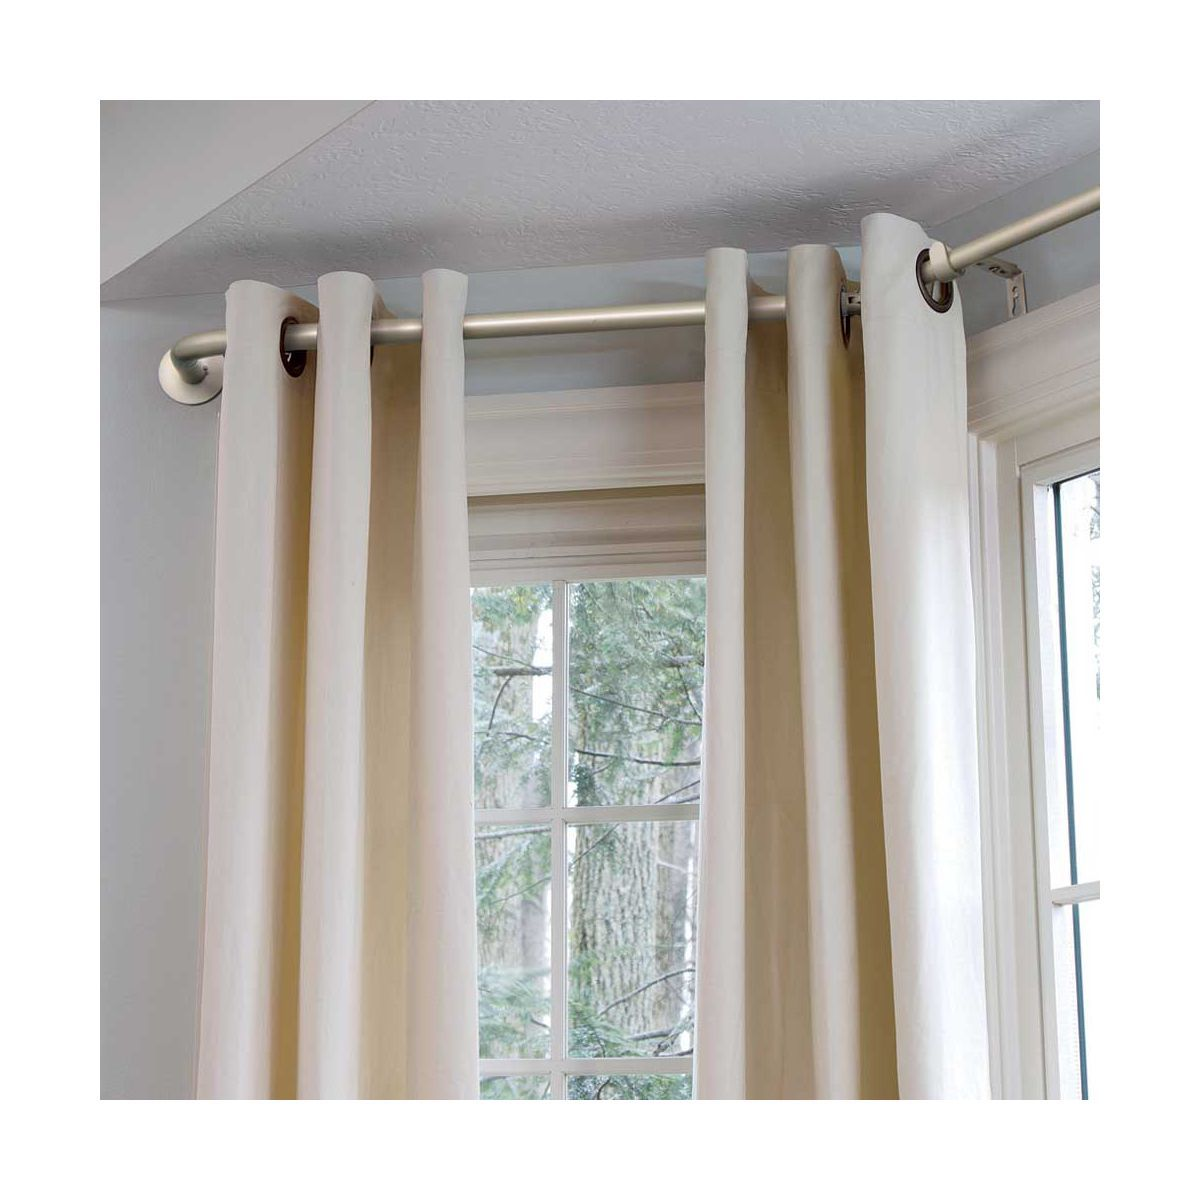 Bay Window Curtain Rod Bay Window Living Room Diy Bay Window Curtains Bay Window Curtain Poles